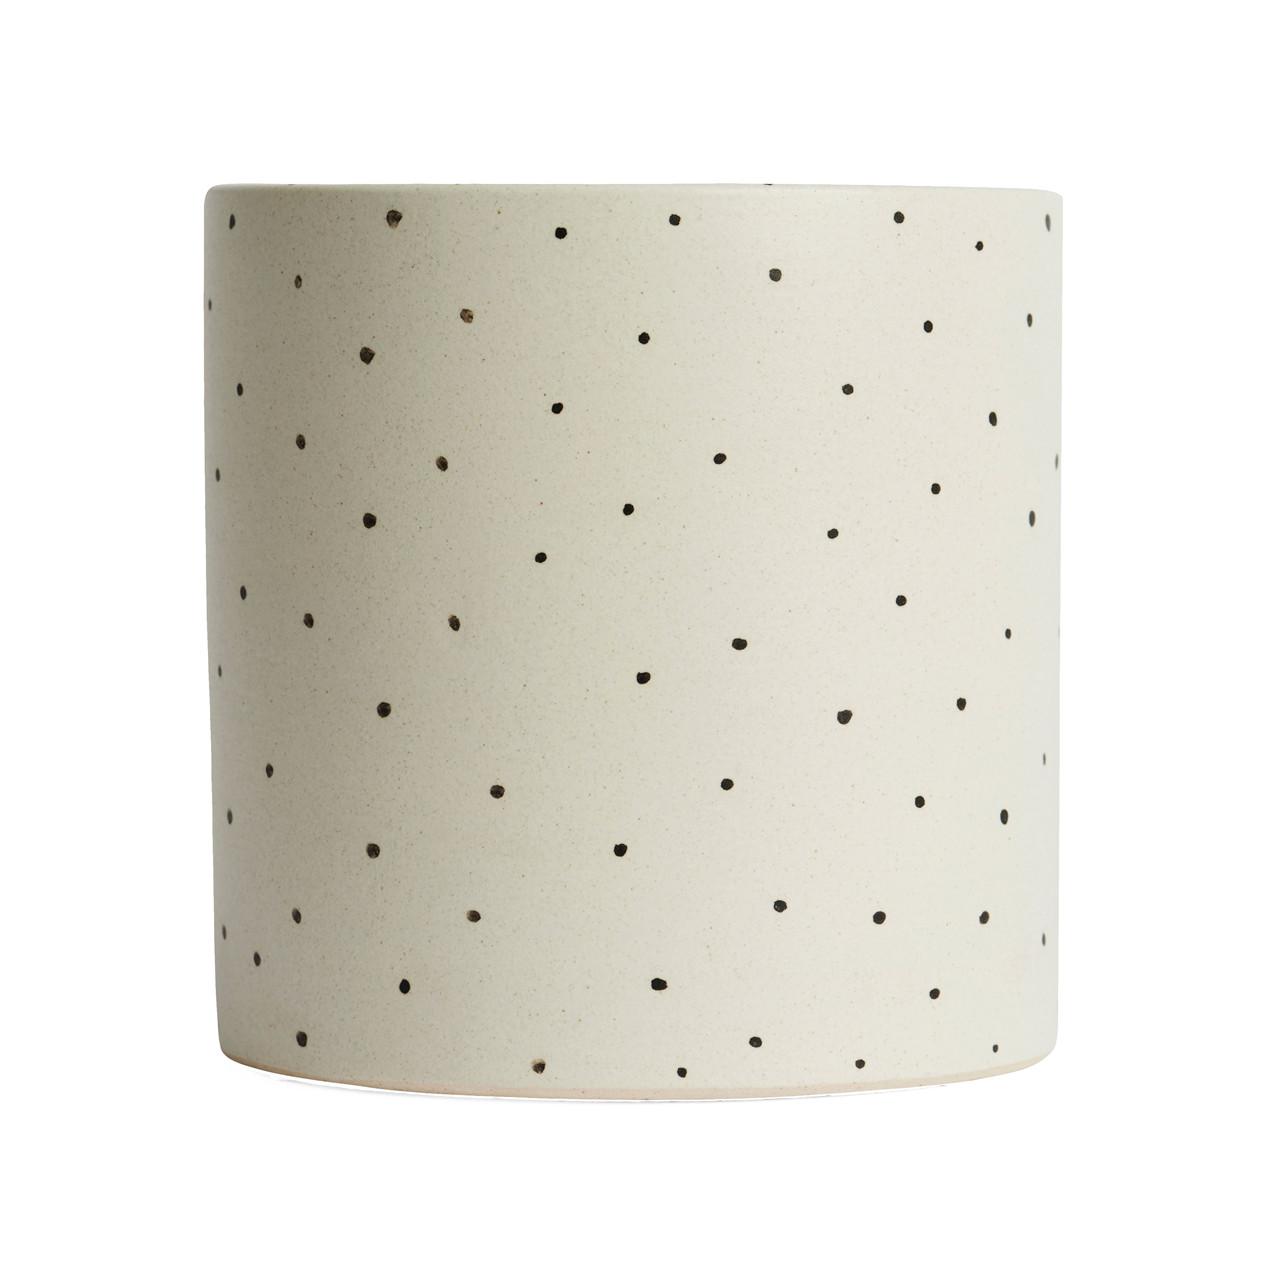 Oyoy Oyoy why-not cylinder large dot fra livingshop